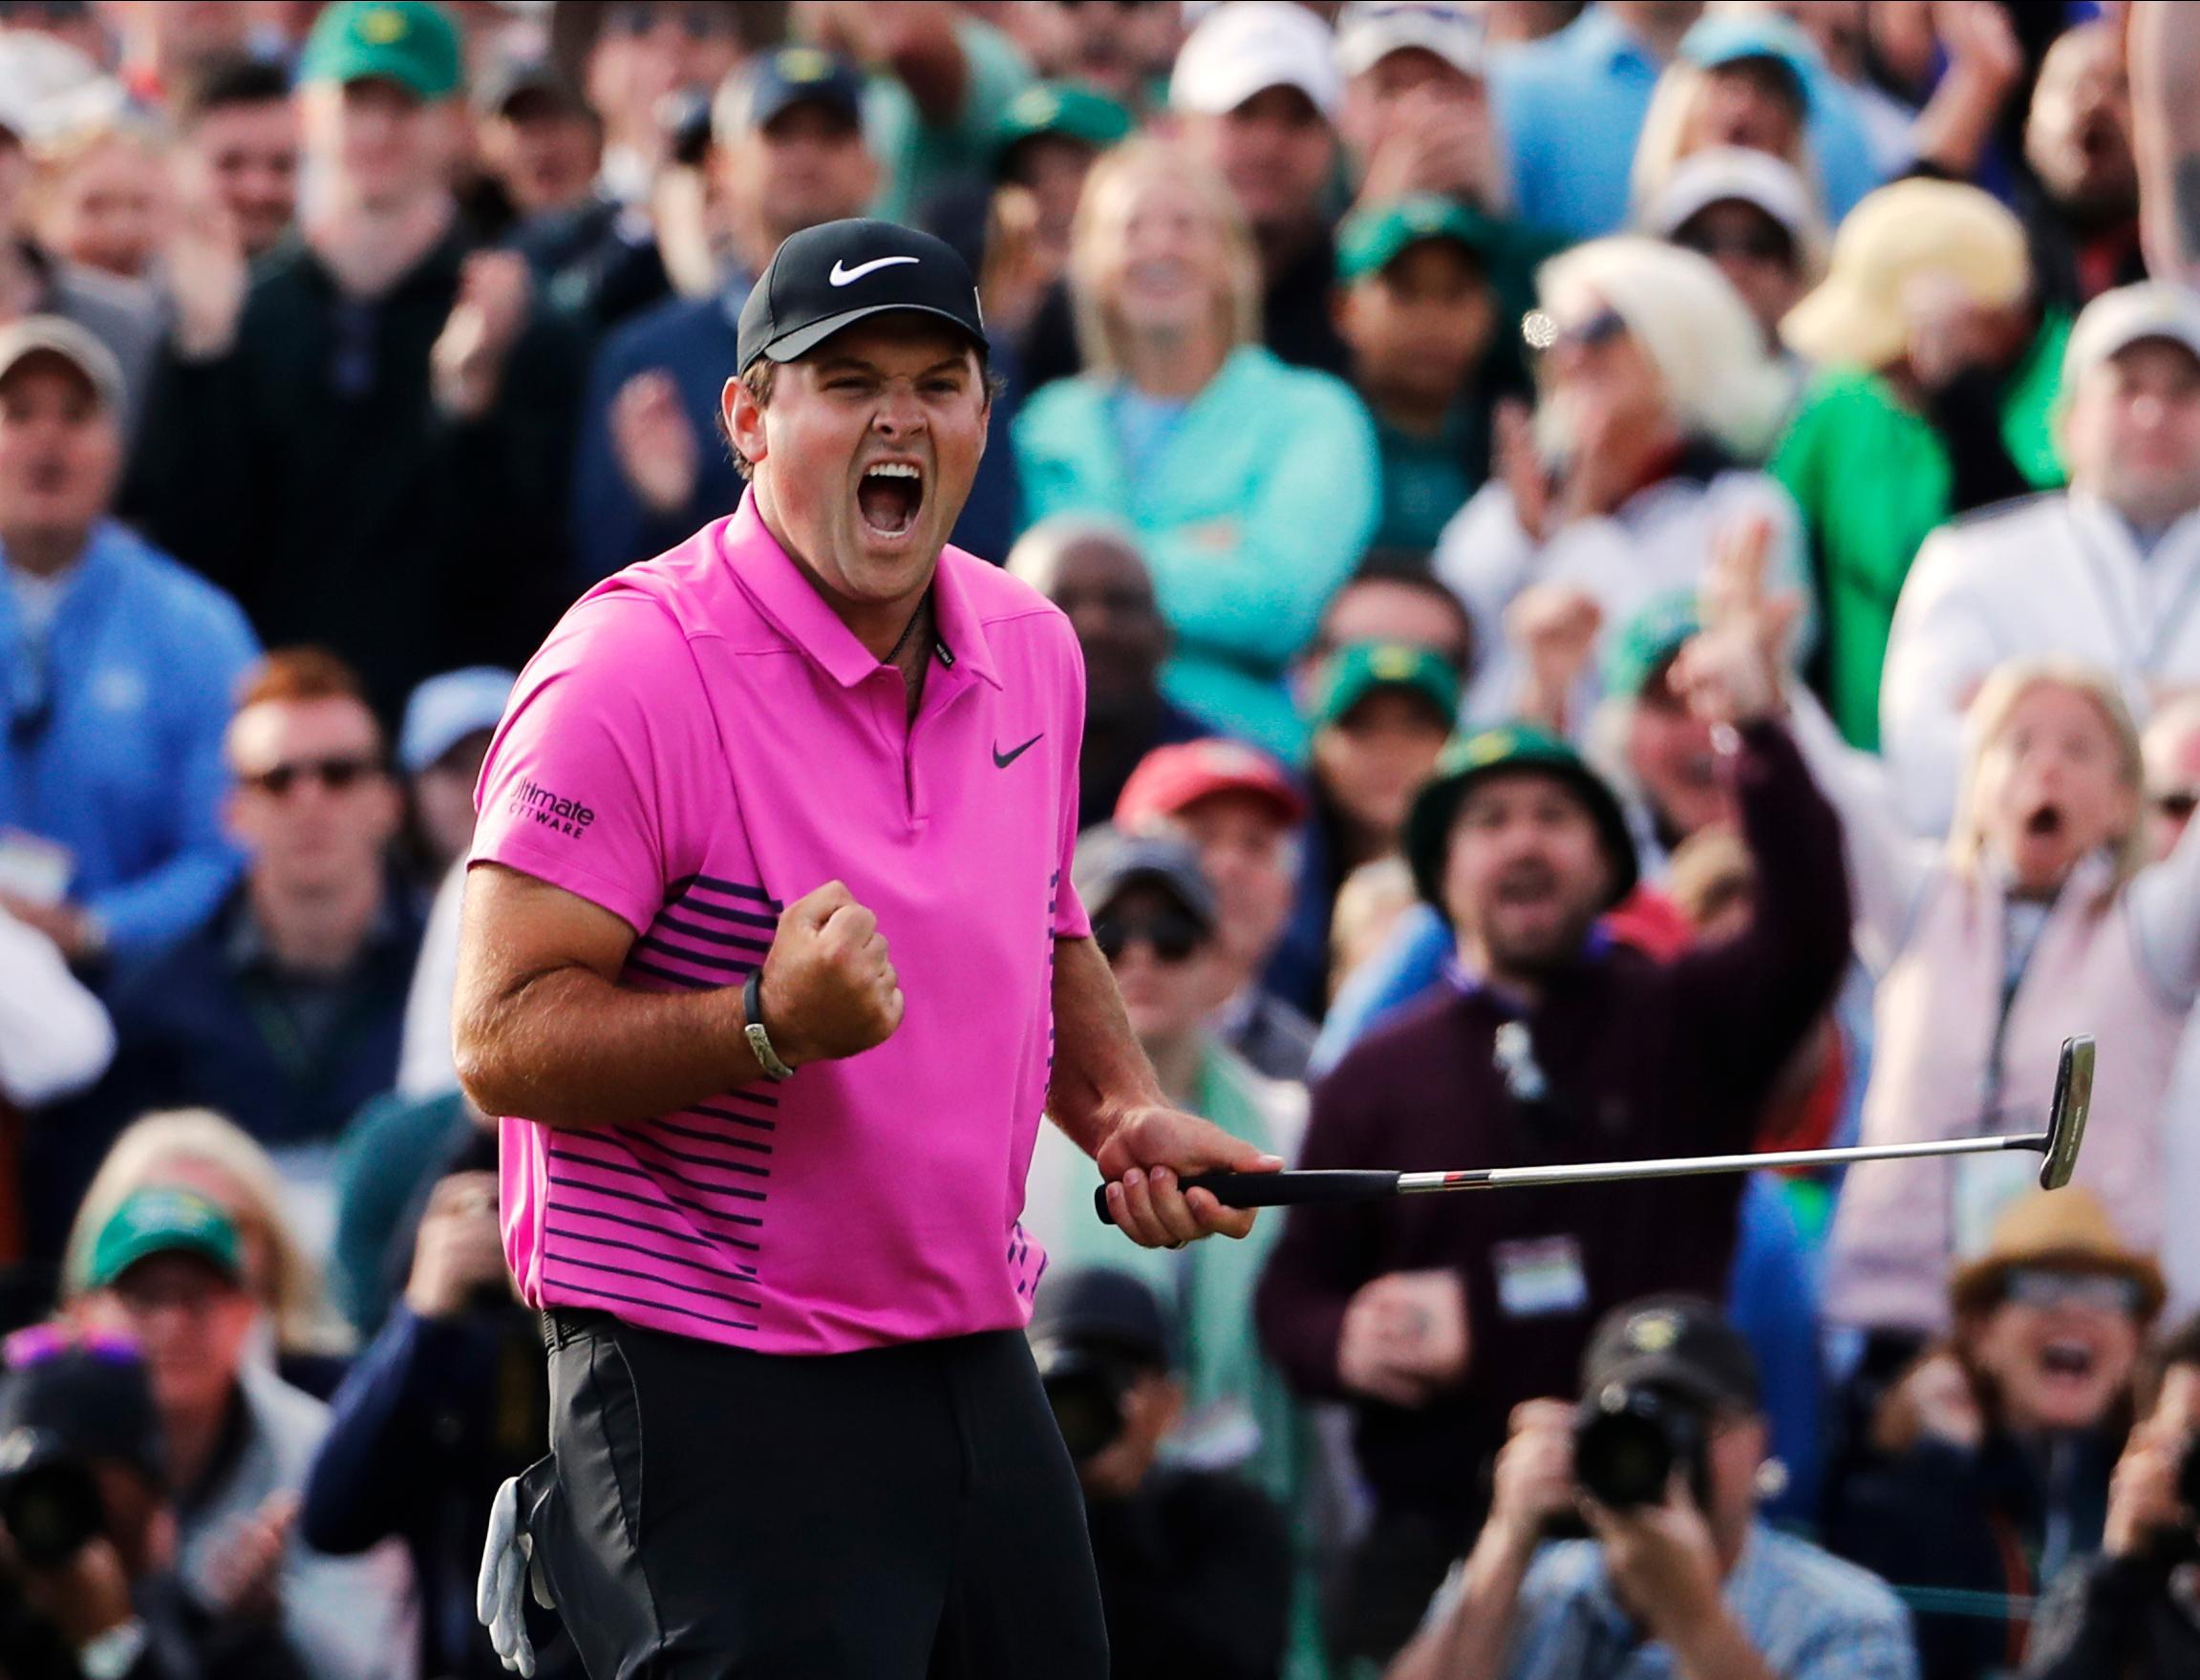 Patrick Reed celebrates winning the Masters